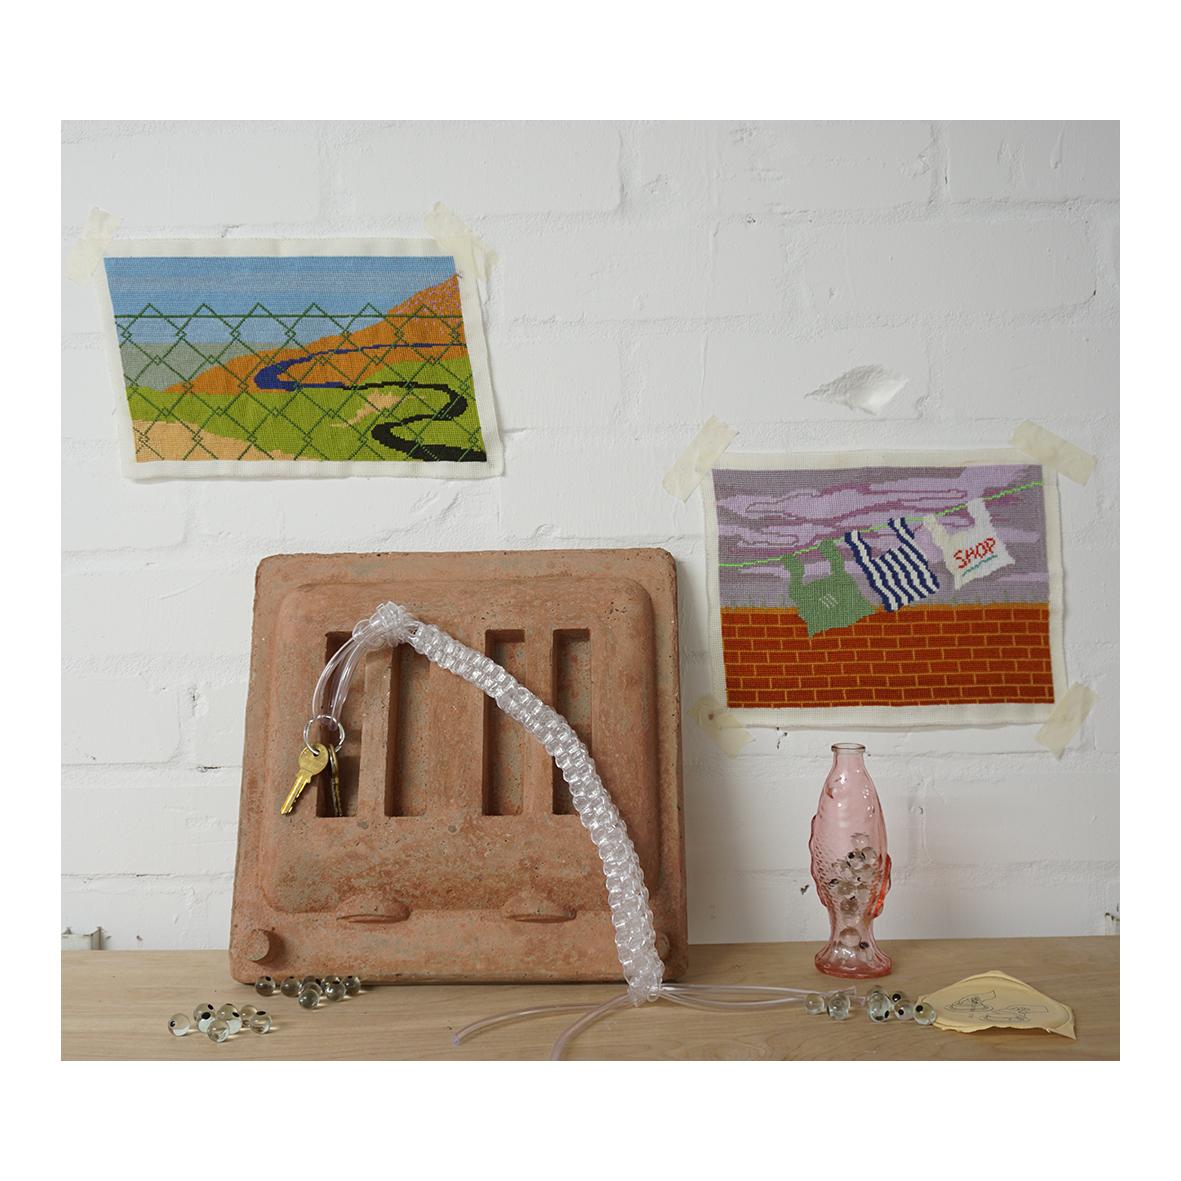 charlotte dawson art Inward, (2020) Cotton Embroidery, Concrete, PVC tubing, Glass, Enamel Paint, Vinegar soaked keys, Plastic disposable lid Dimensions variable